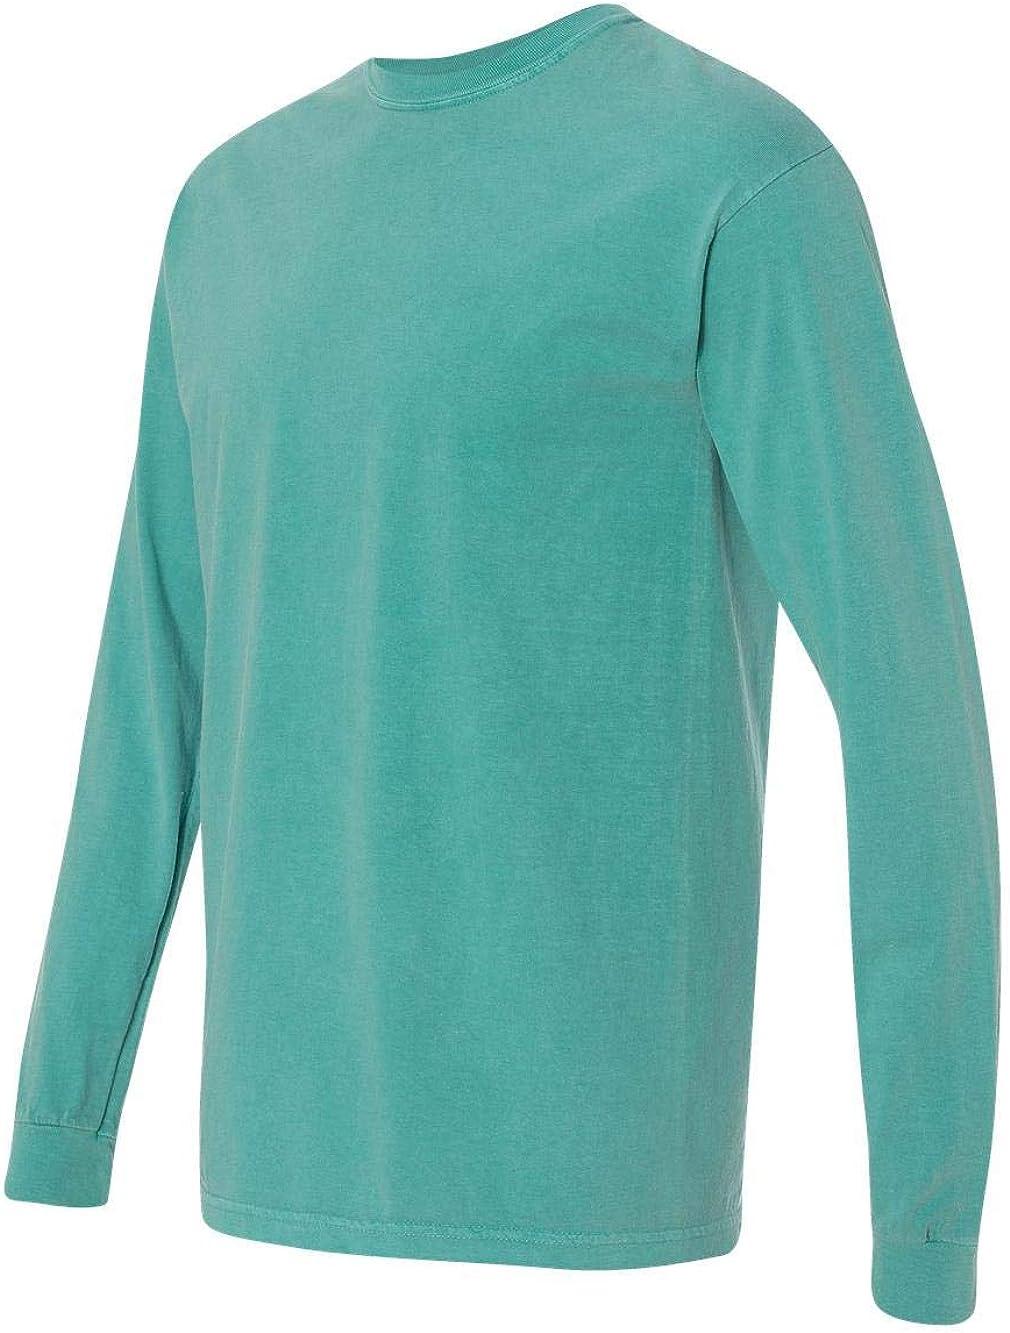 Comfort Colors Ringspun Garment-Dyed Long-Sleeve T-Shirt (C6014)- SEAFOAM, M